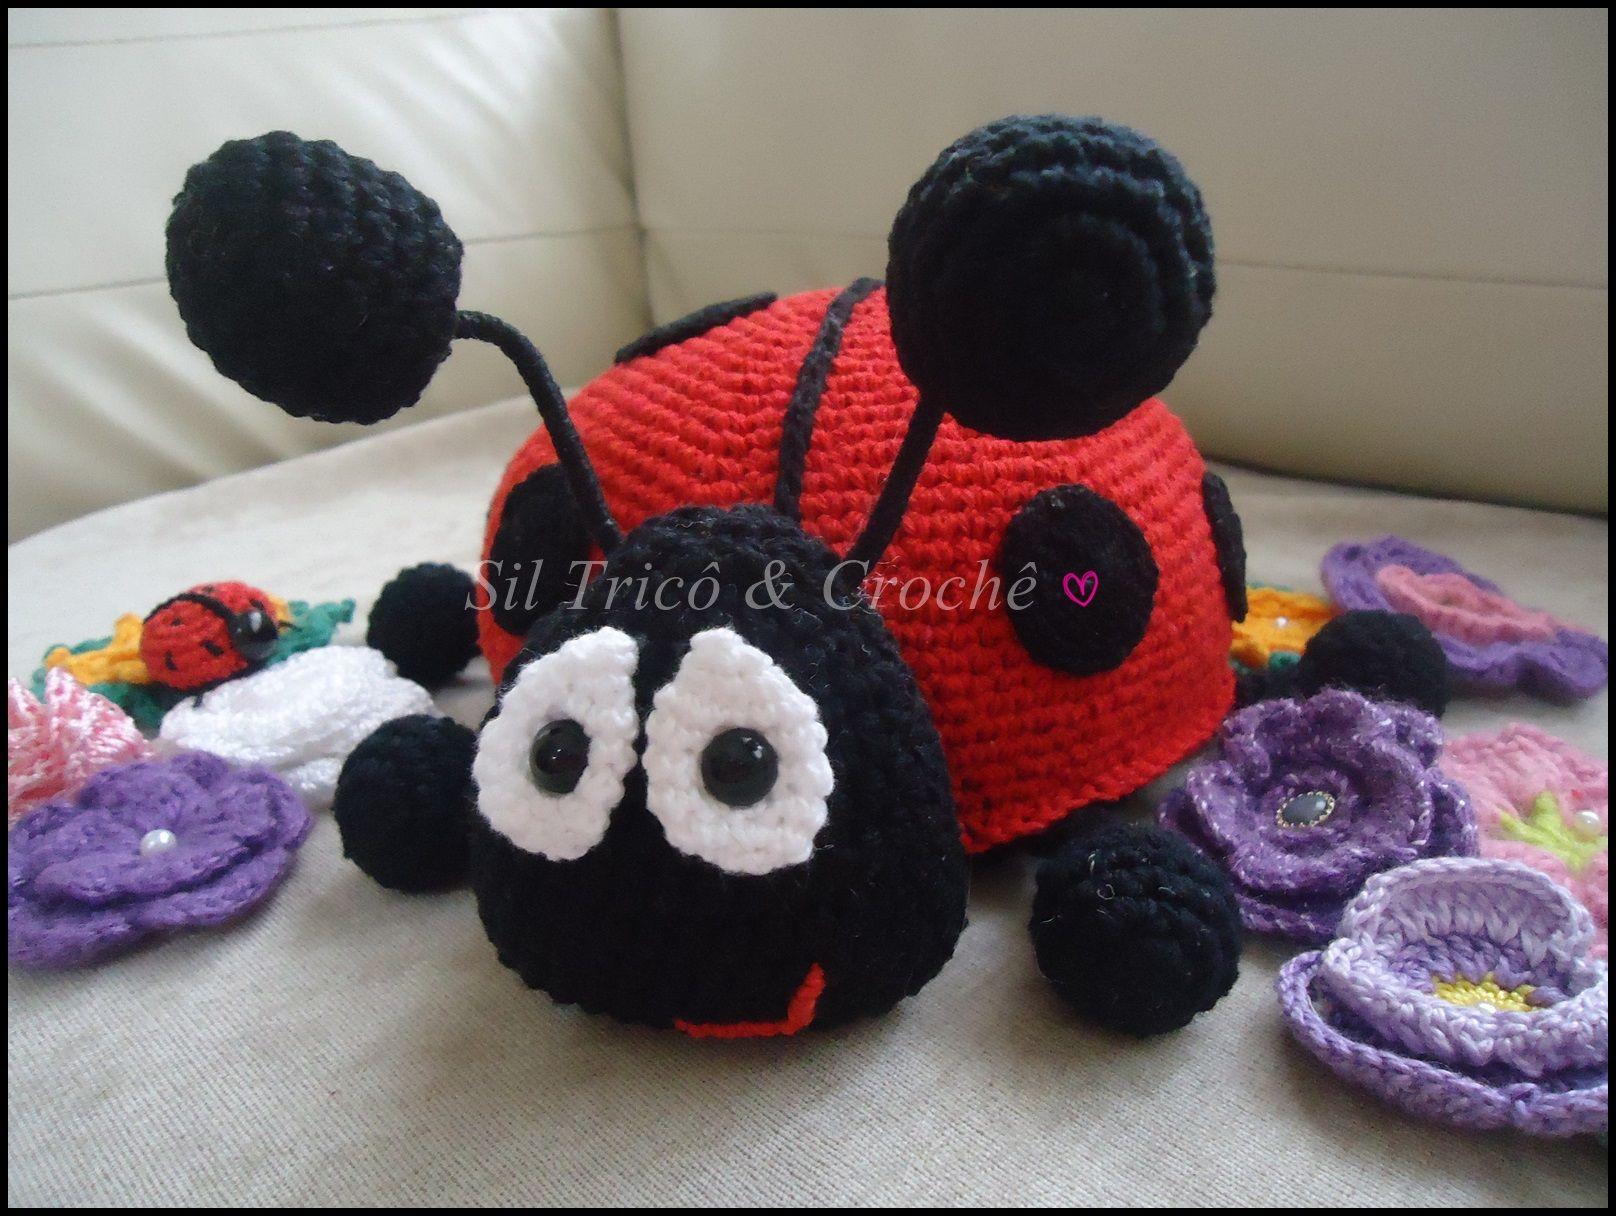 Amigurumi Oso Pijama : Joaninha peso para porta em crochê amigurumis crochet